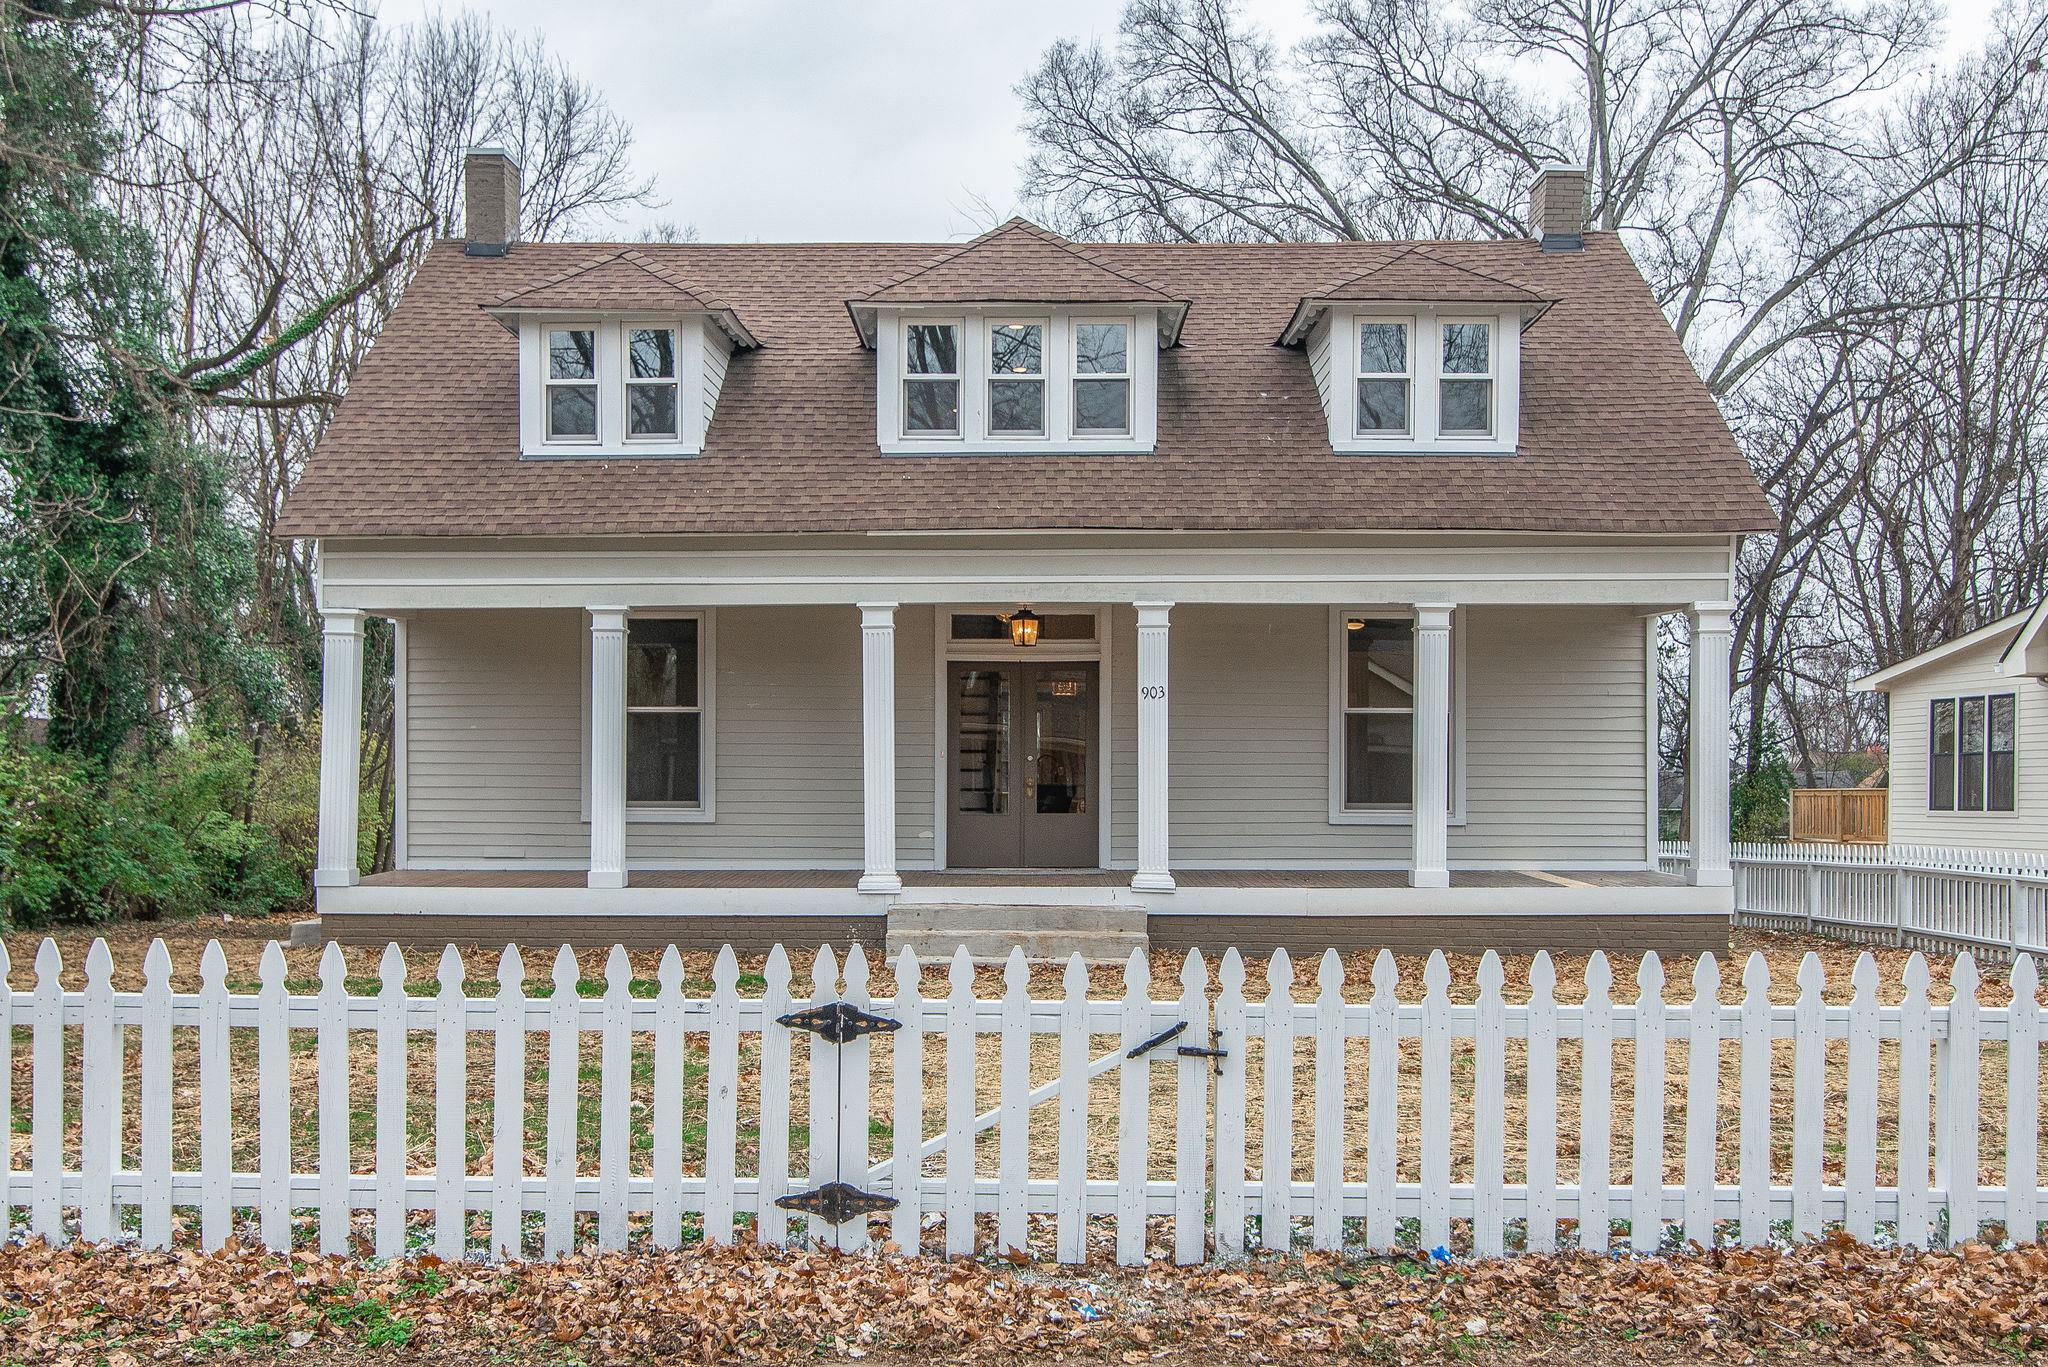 903 N 14Th St, Nashville, TN 37206 - Nashville, TN real estate listing